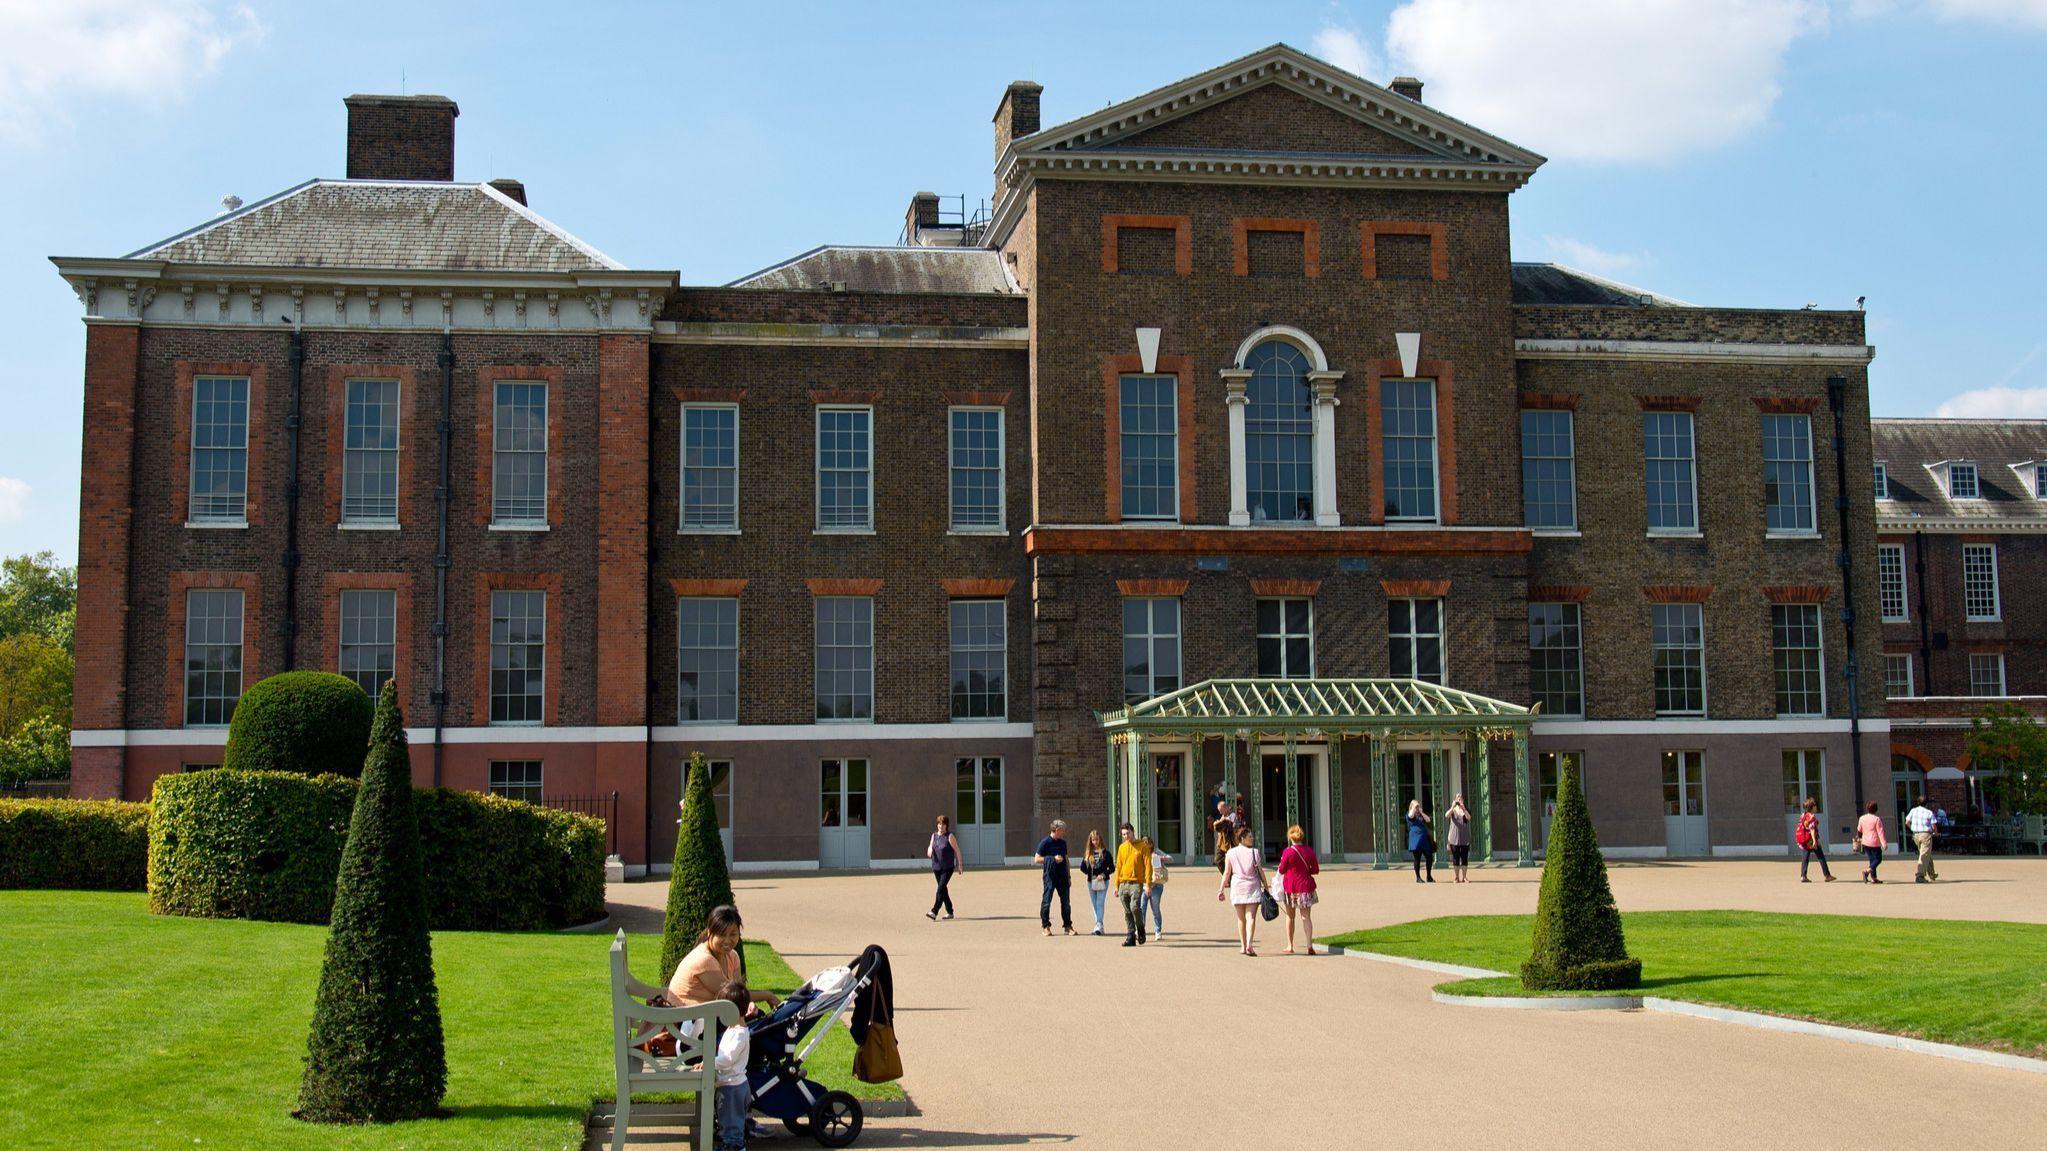 A view of Kensington Palace.